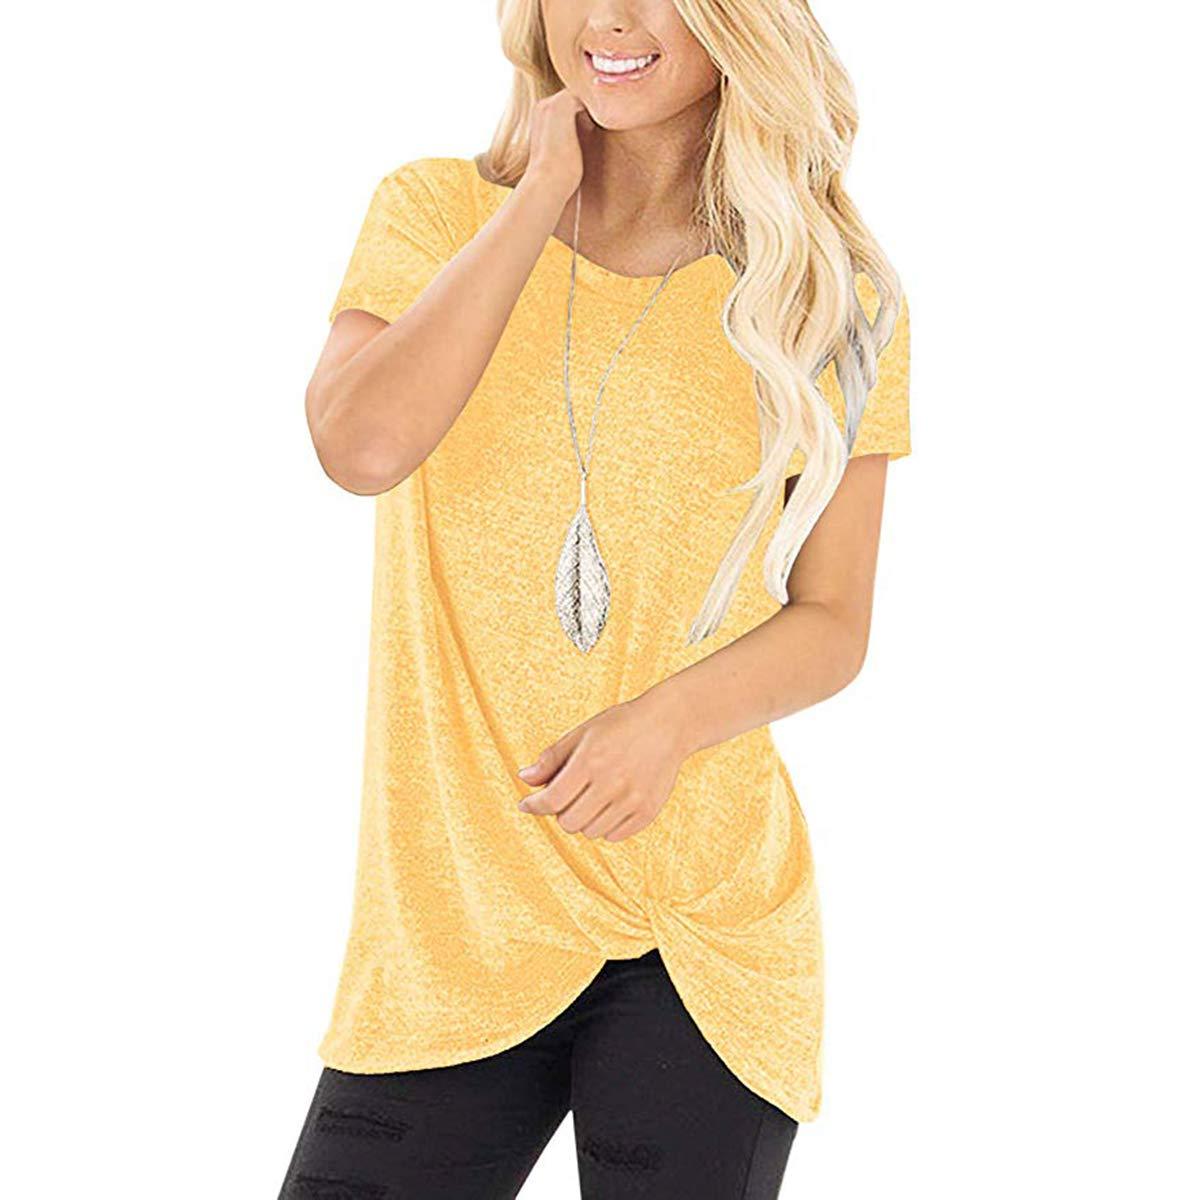 Tshirt Yellow Ilfioreemio Women Knit Tunic Top Round Neck Blouse Knot Twist Front Long Sleeve Casual Soft Sweatshirt